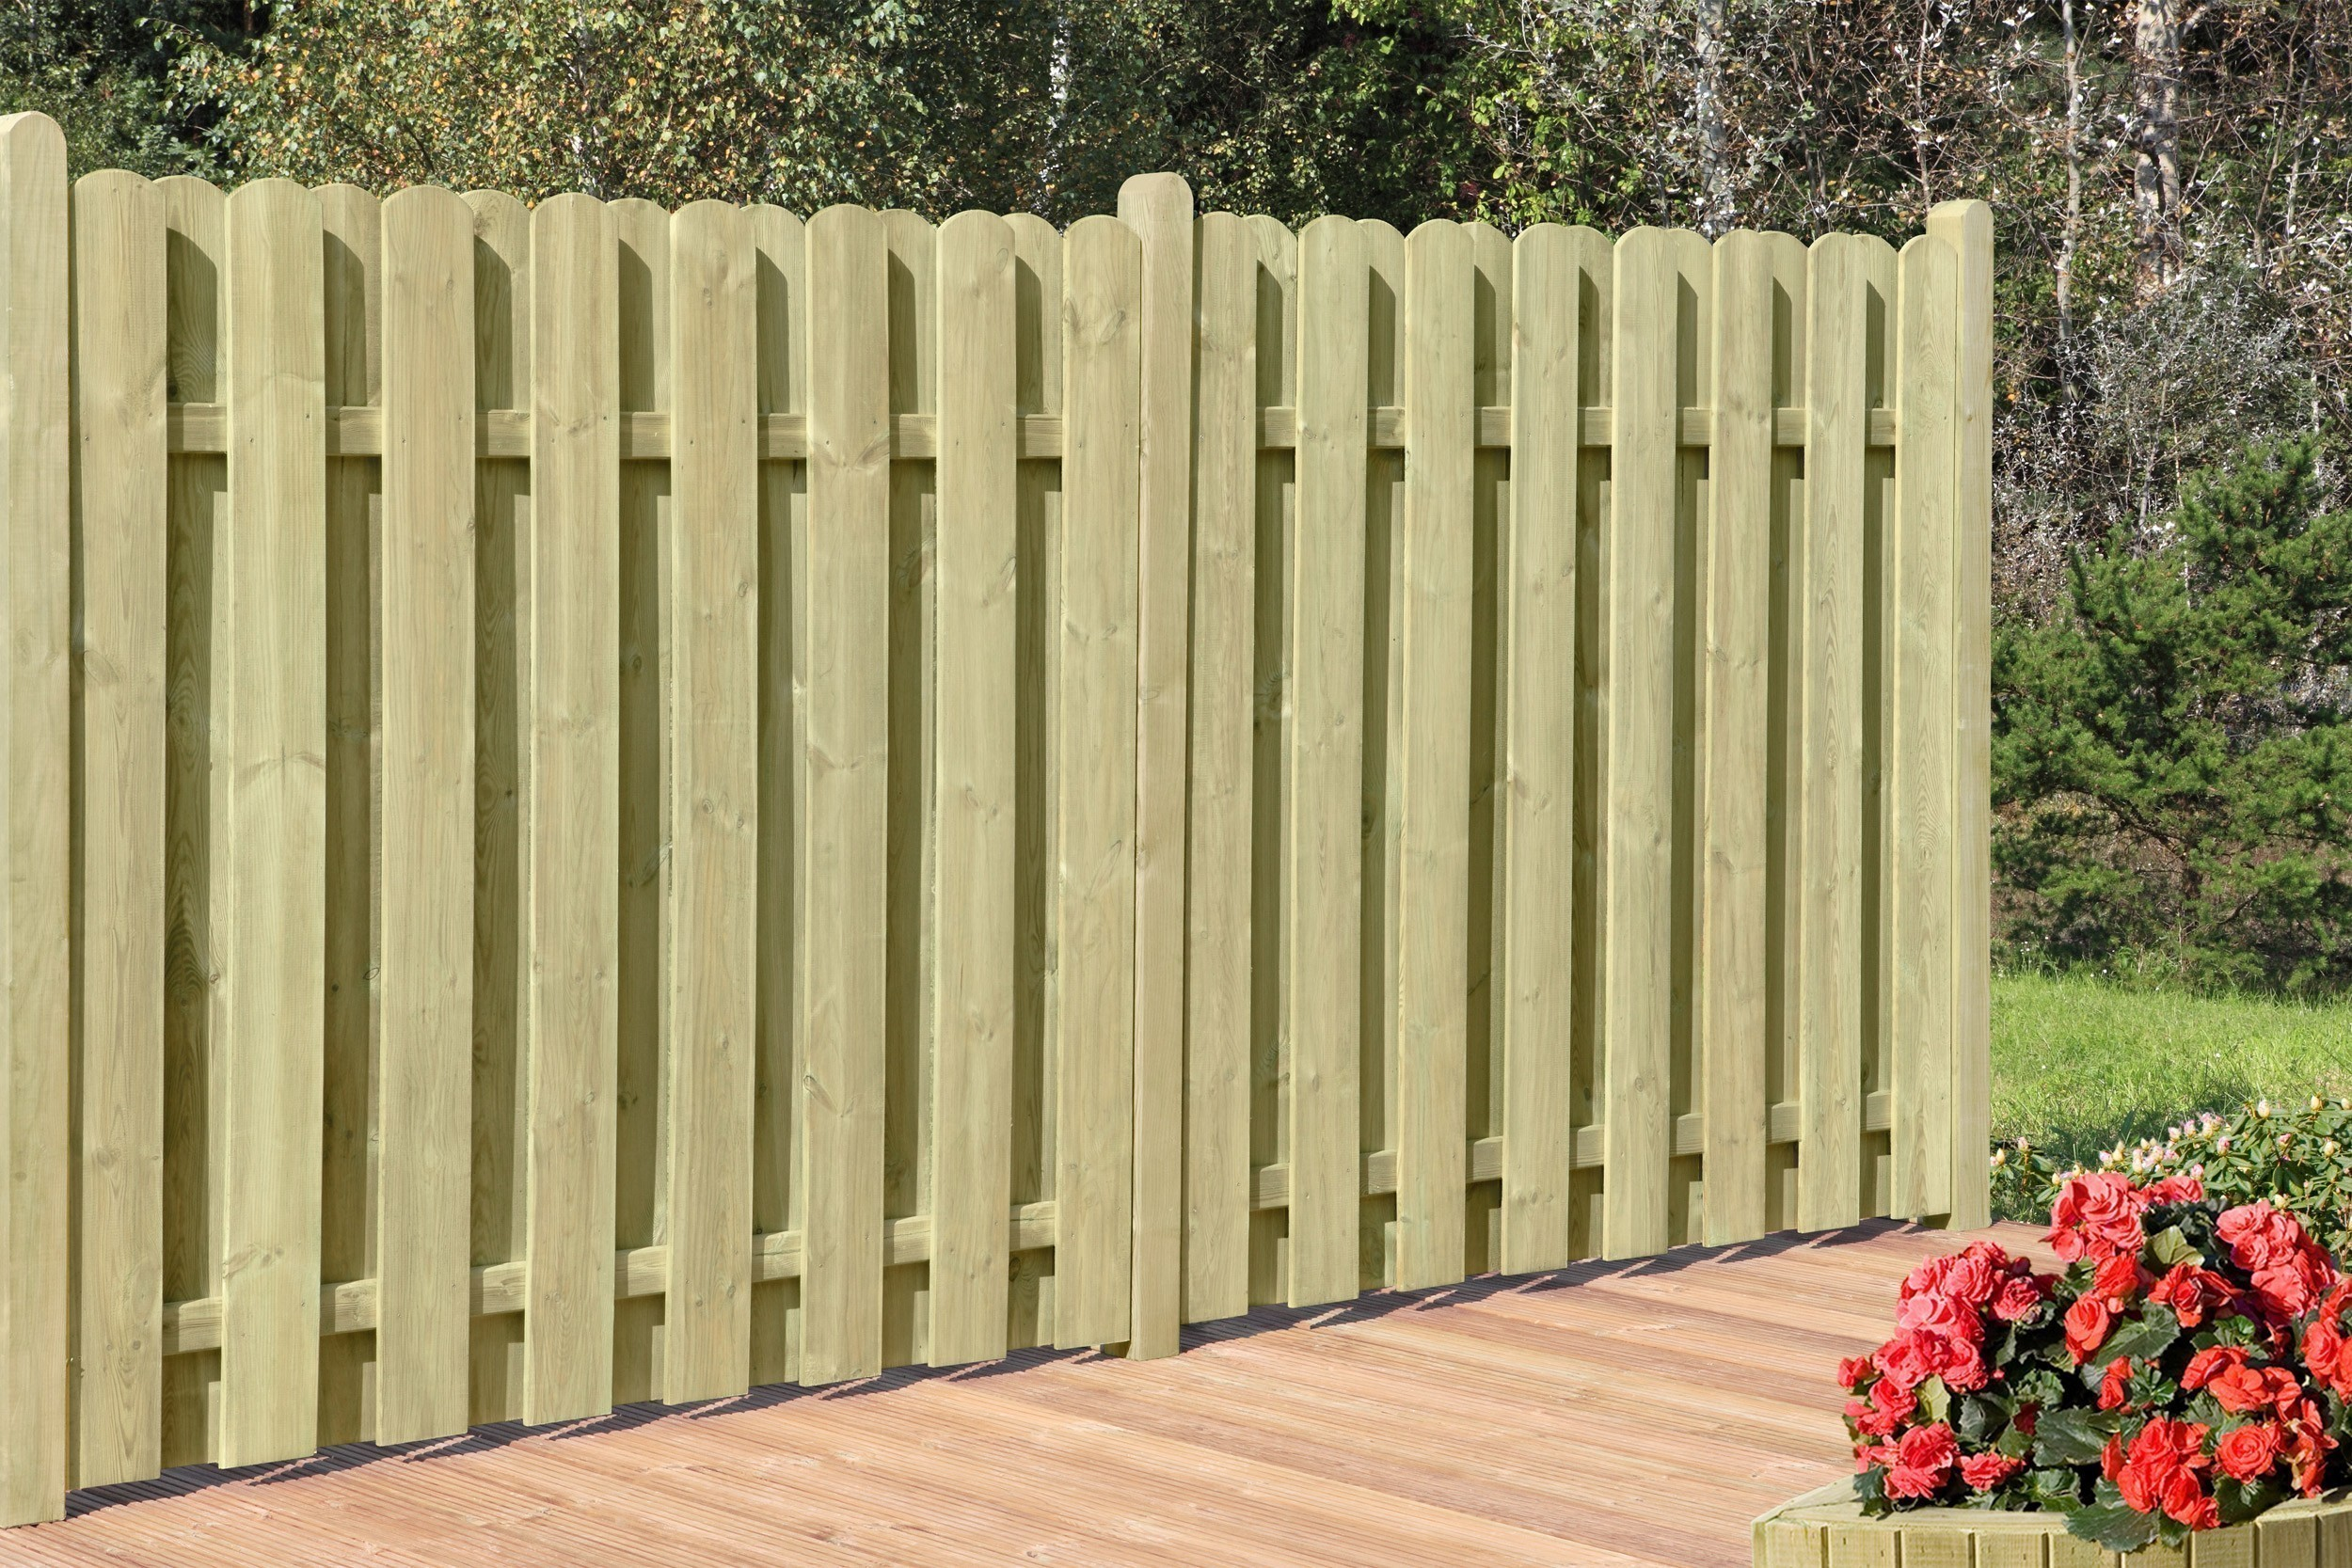 Fabulous Sichtschutzzaun / Bohlenzaun Schrägelement Holz kdi 90x160/90cm LQ73